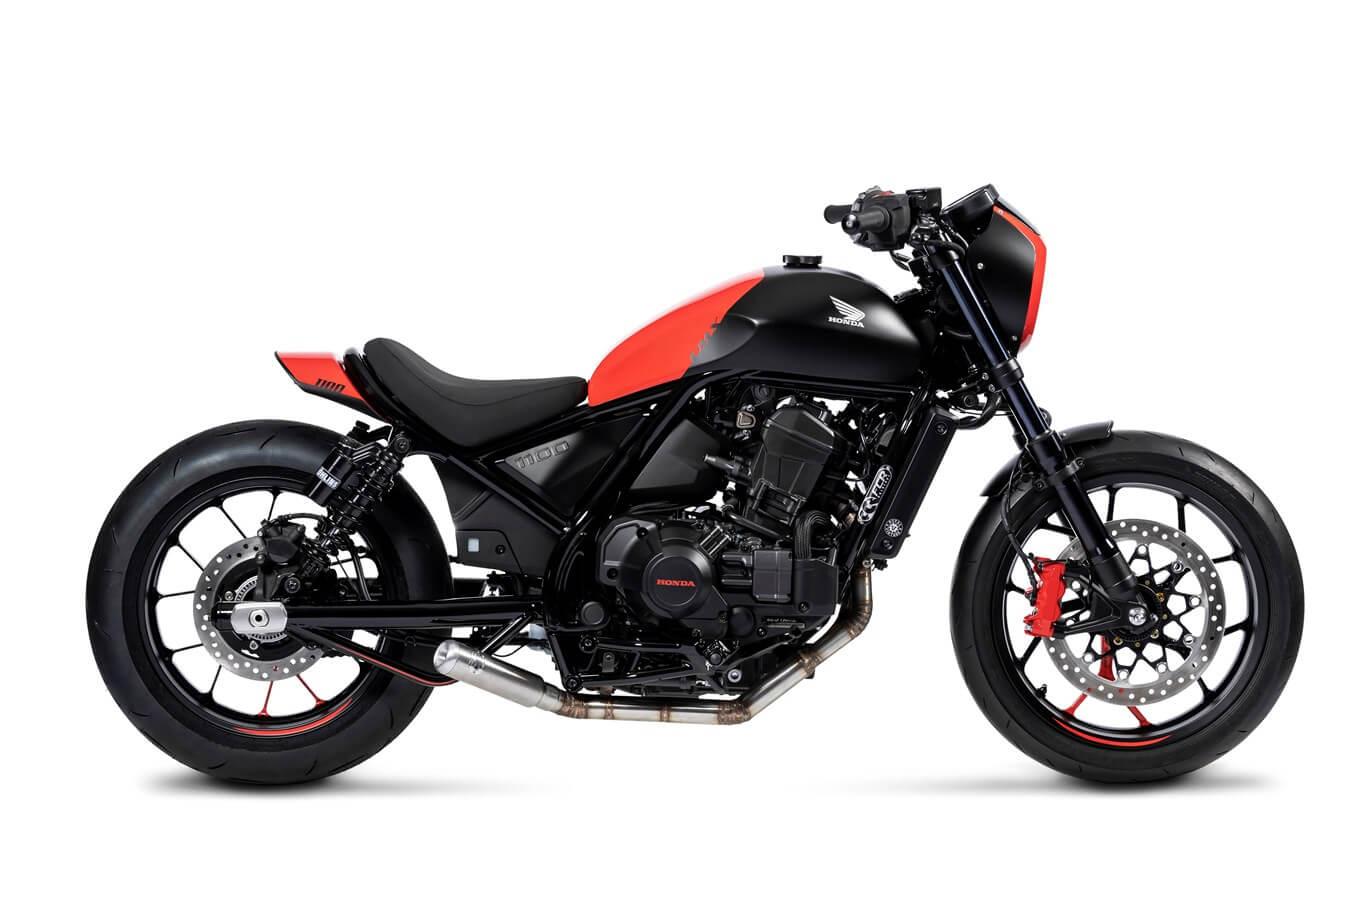 Custom Honda Rebel 1100 Sport Cruiser / Motorcycle | CMX 1100